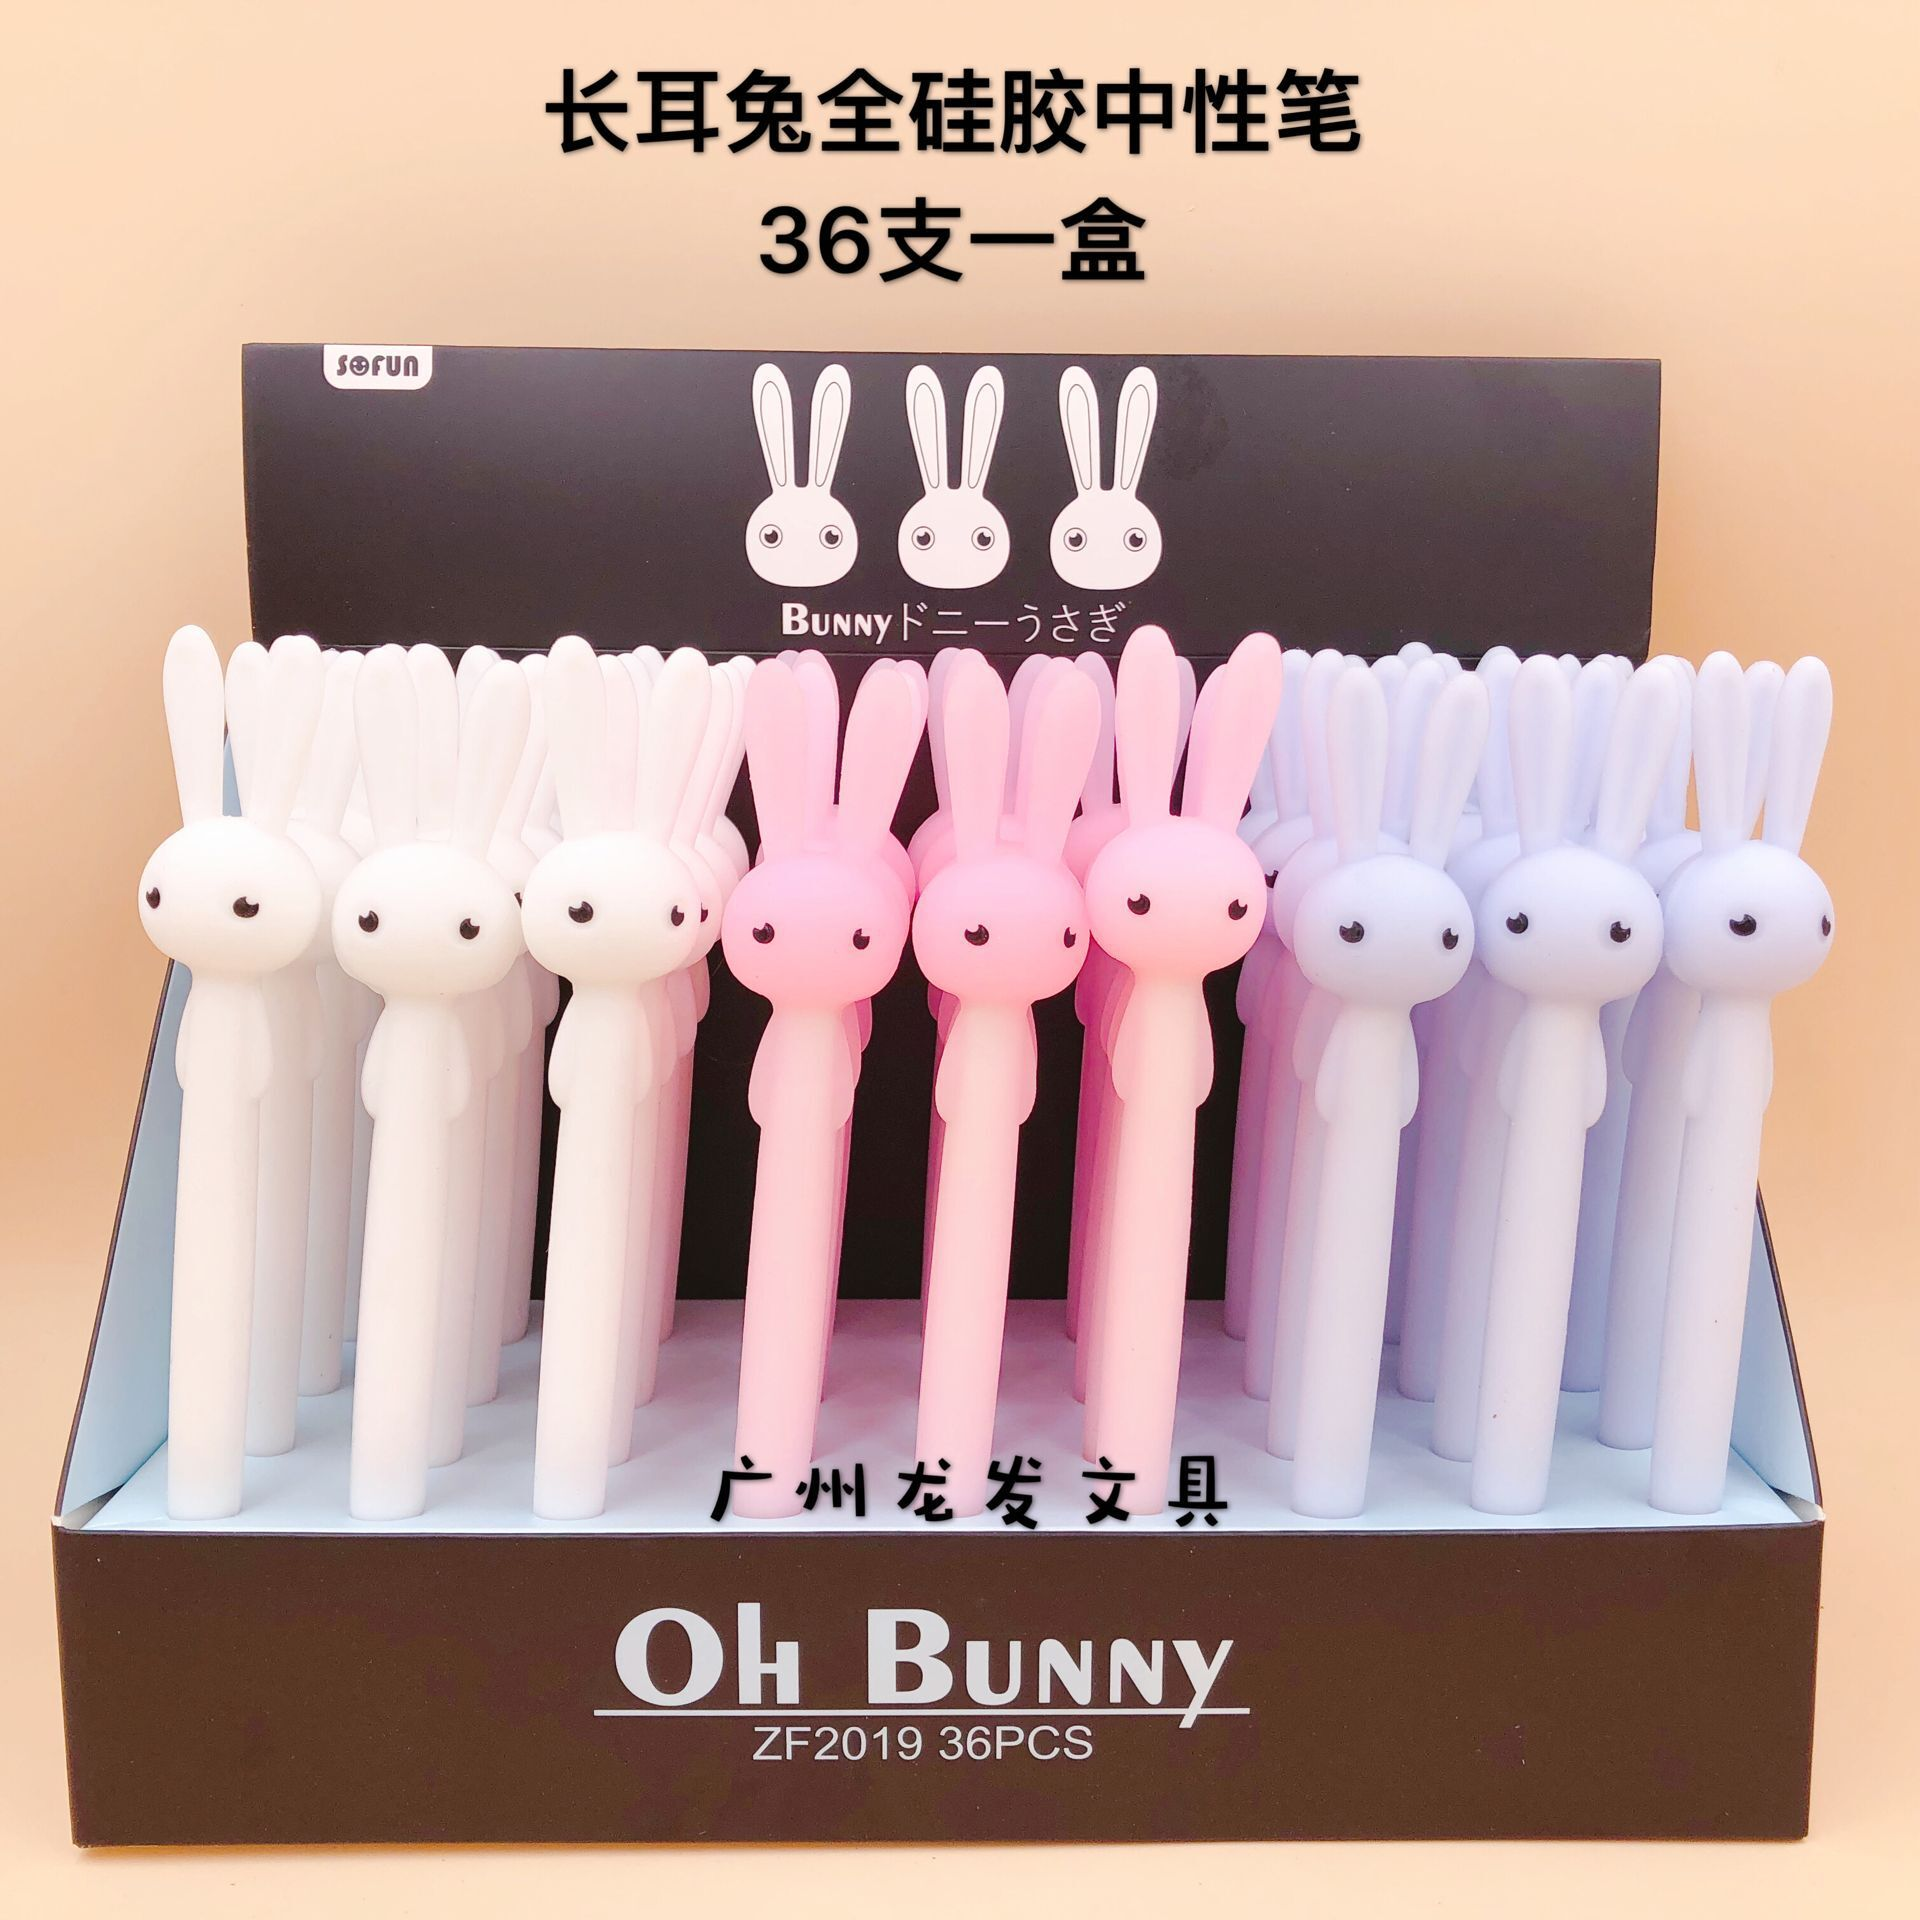 36pcs Gel Pens Long-eared Rabbit Black Gel-ink Pen Student for Writing Cute Stationery Office School Supplies